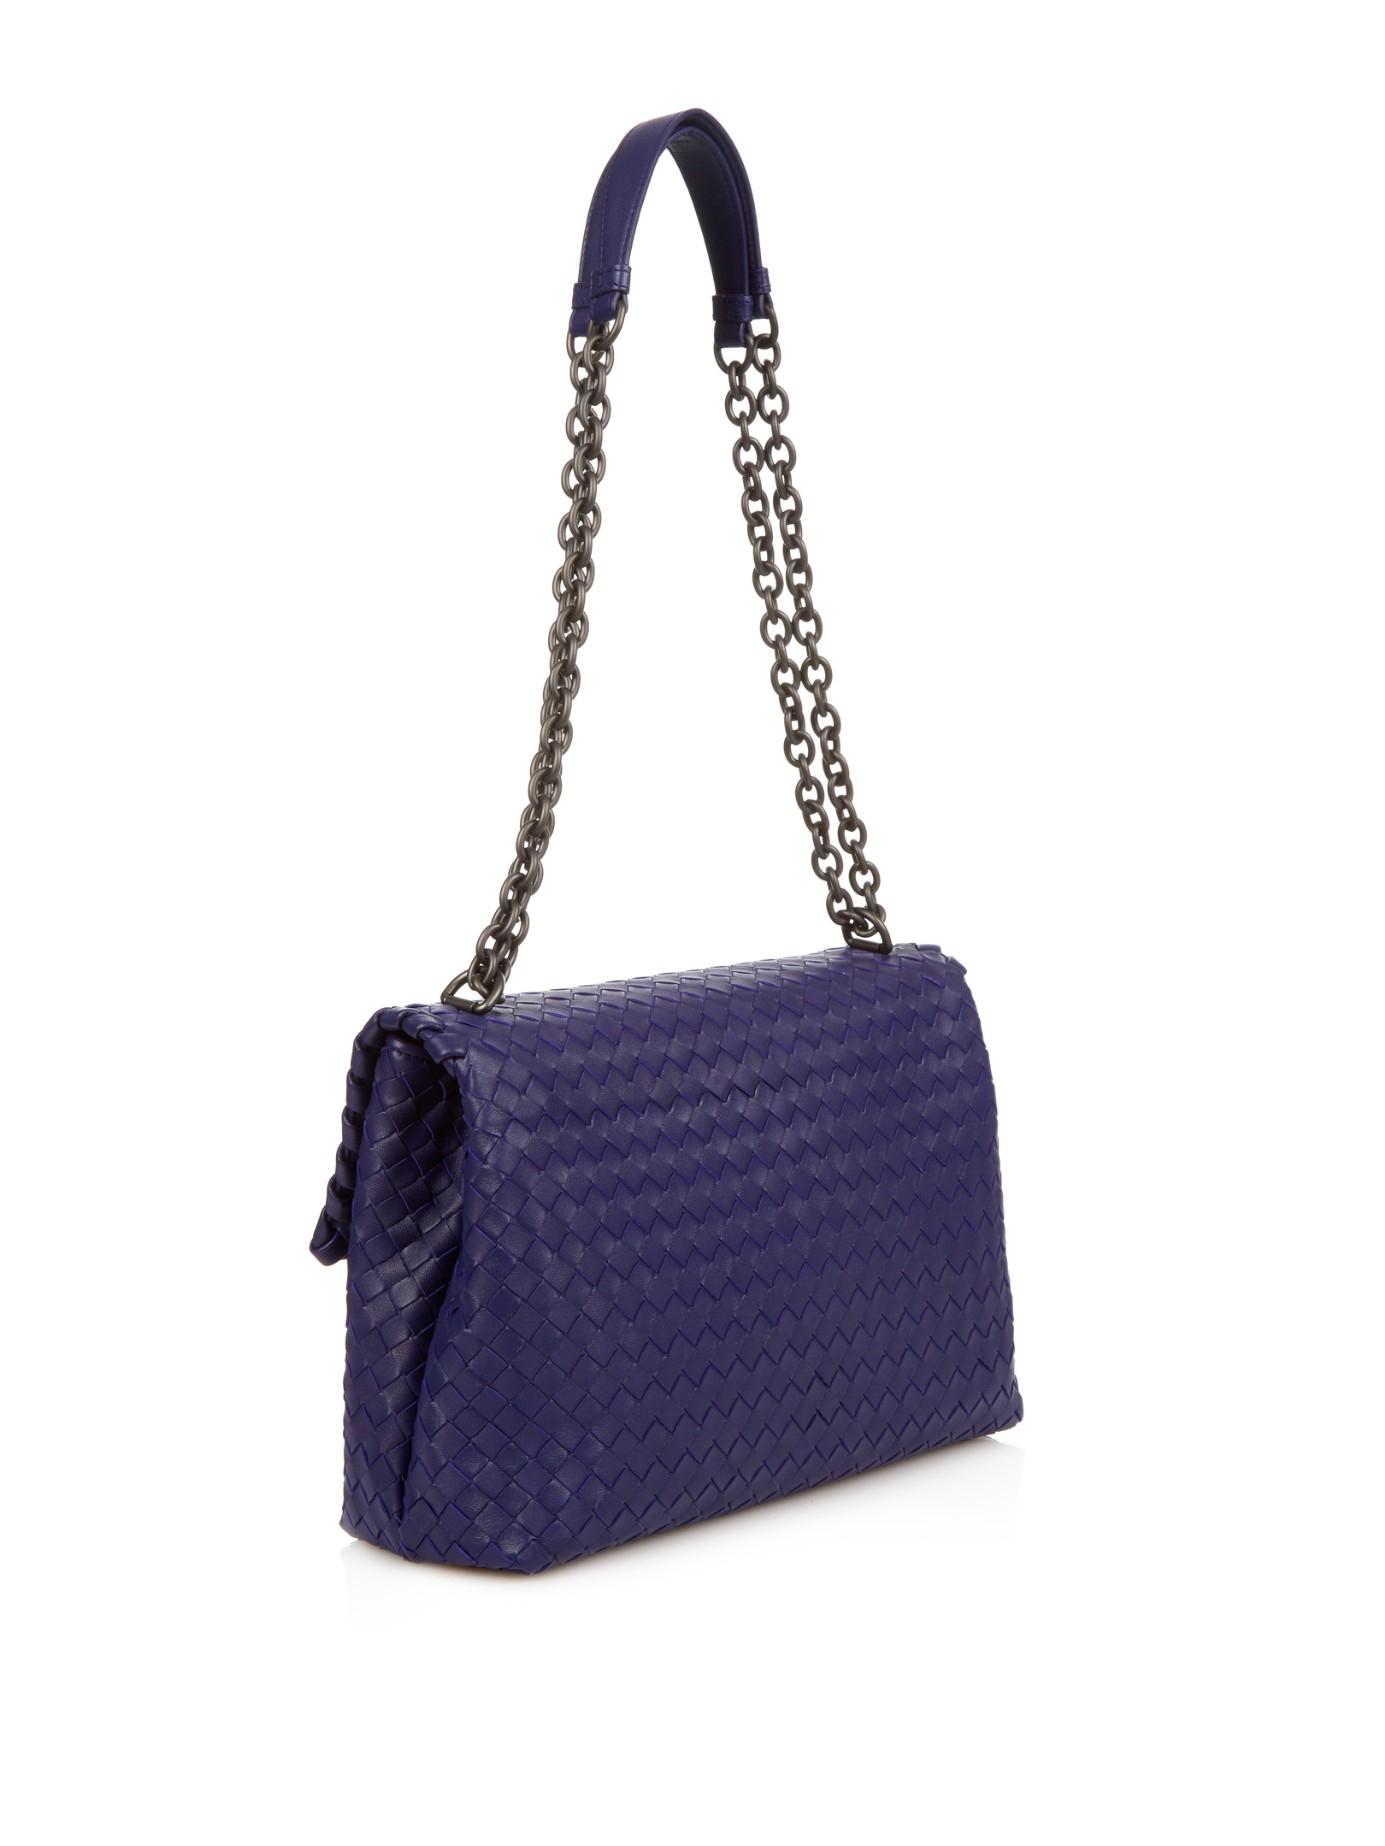 Bottega veneta Olimpia Intrecciato Leather Shoulder Bag in Blue | Lyst